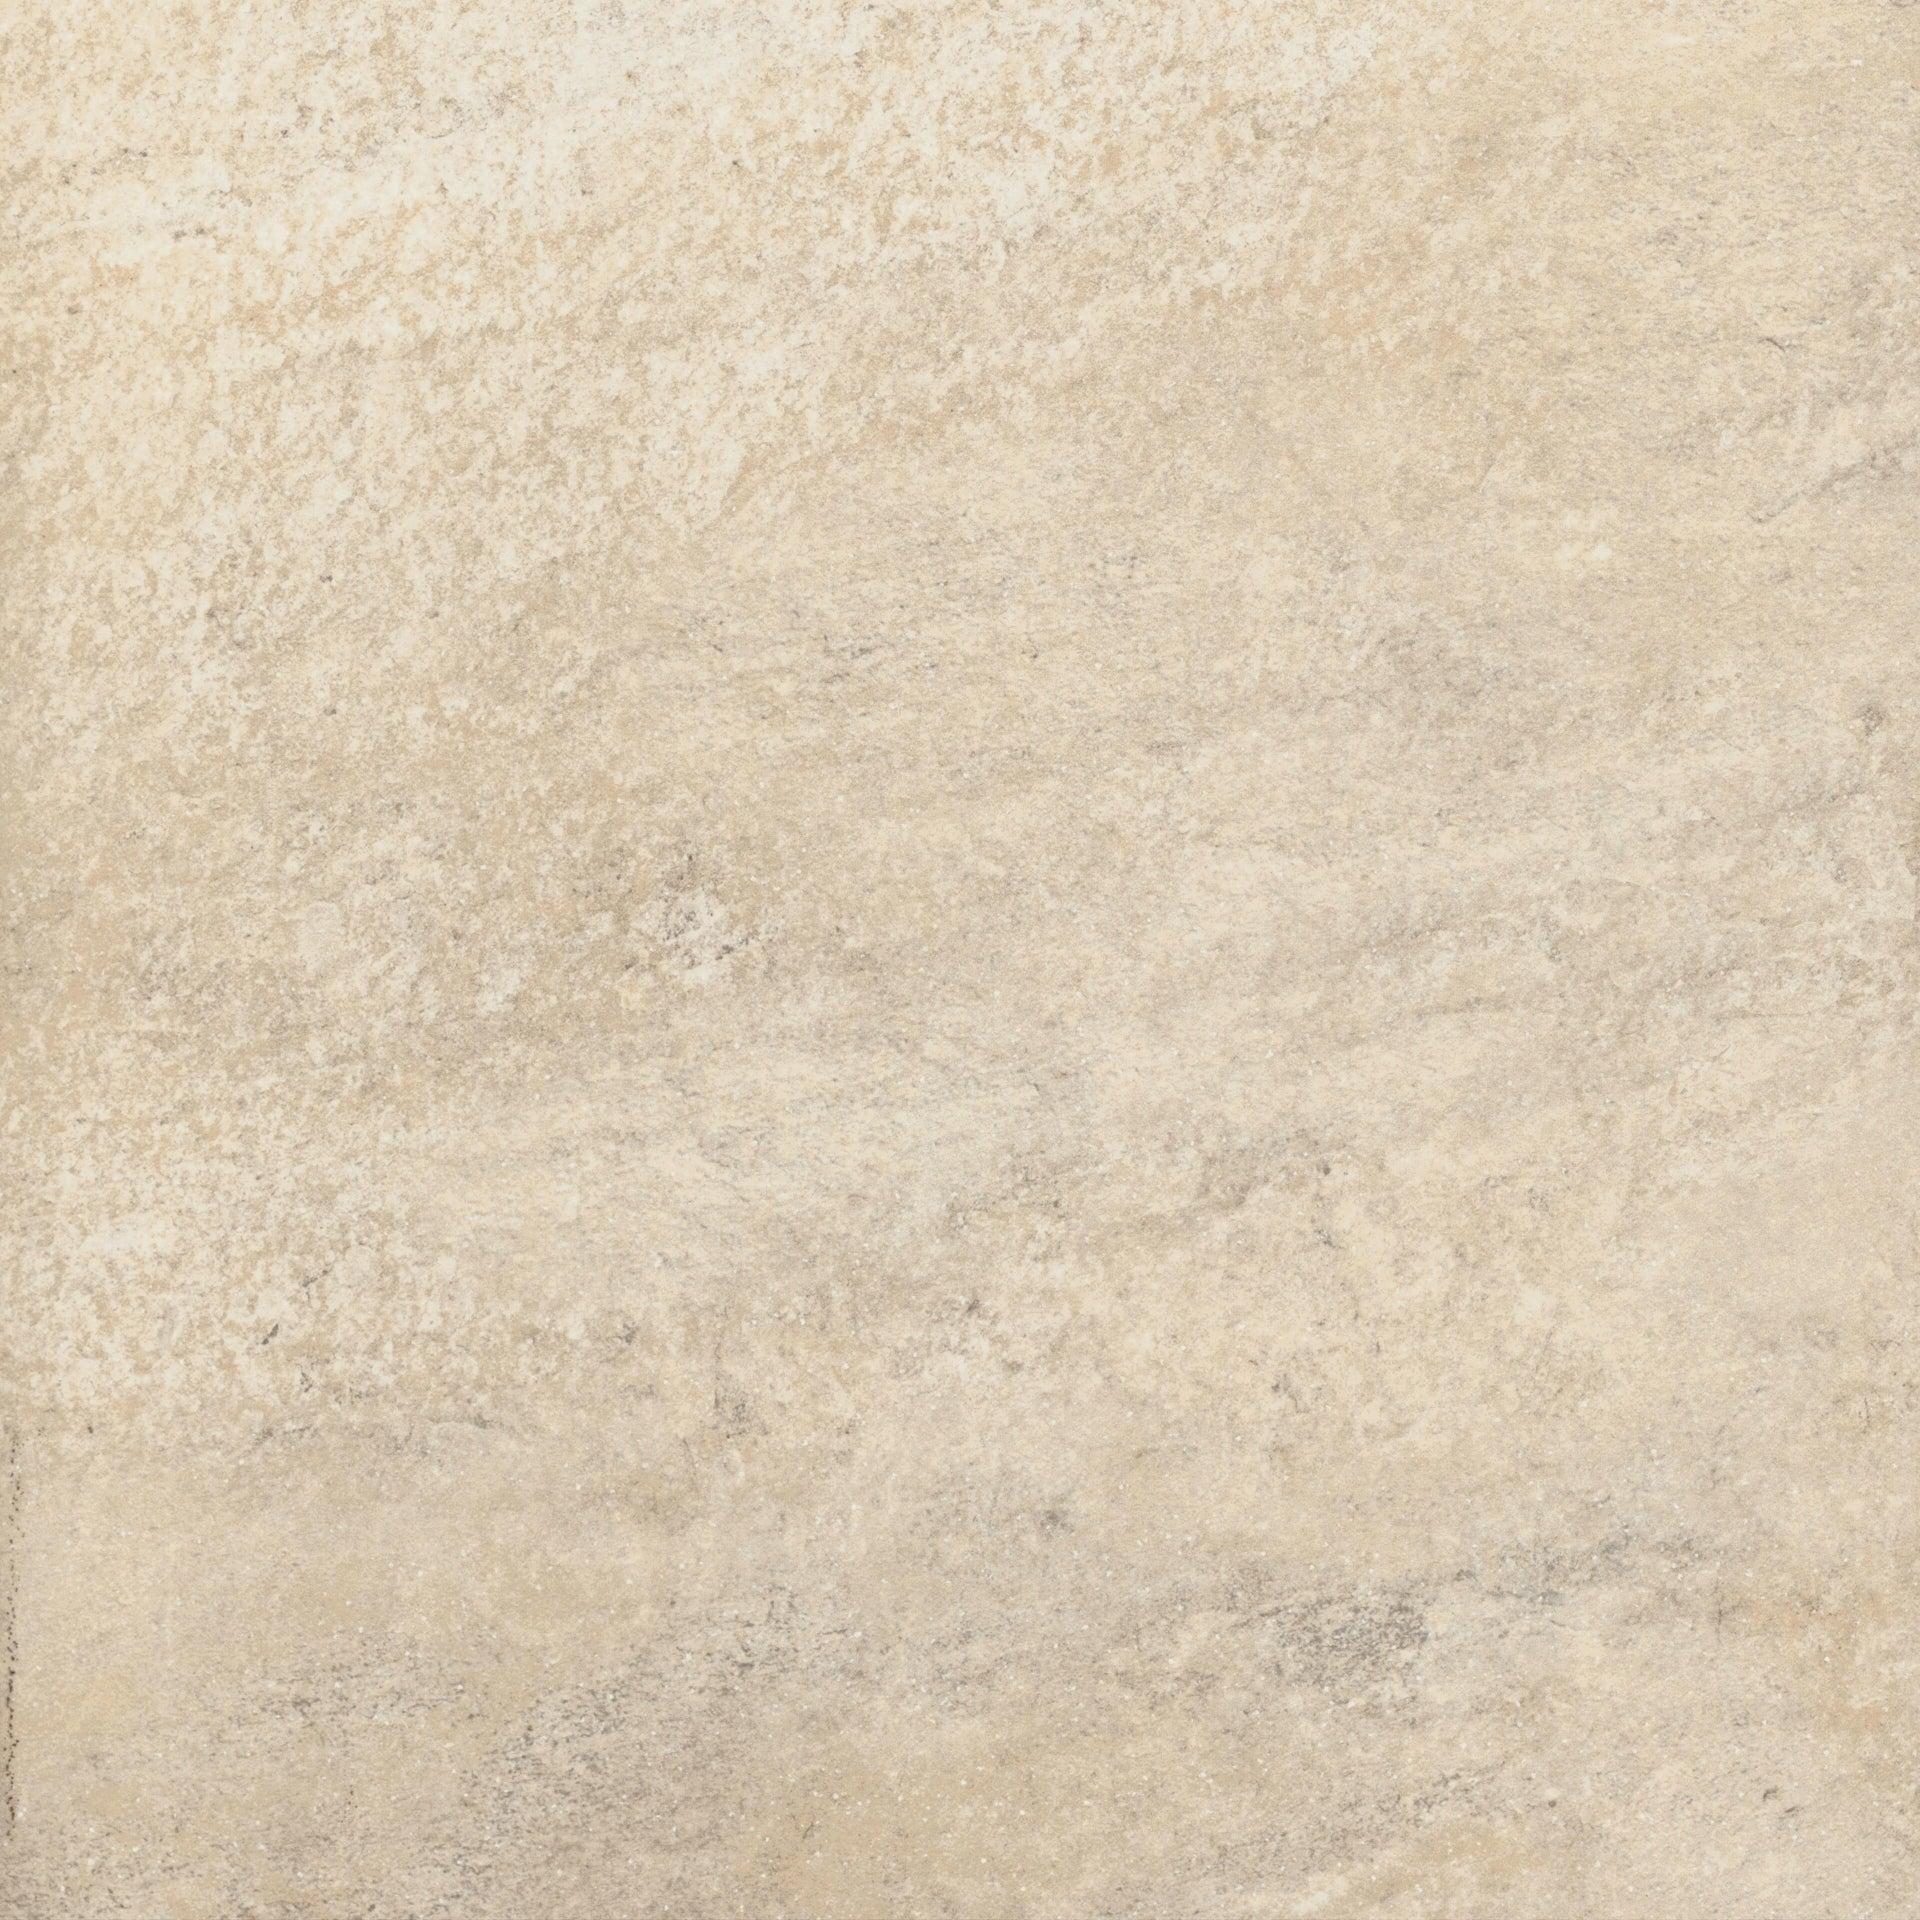 Piastrella da pavimento Walk 32.5 x 32.5 cm sp. 9 mm PEI 3/5 beige - 8